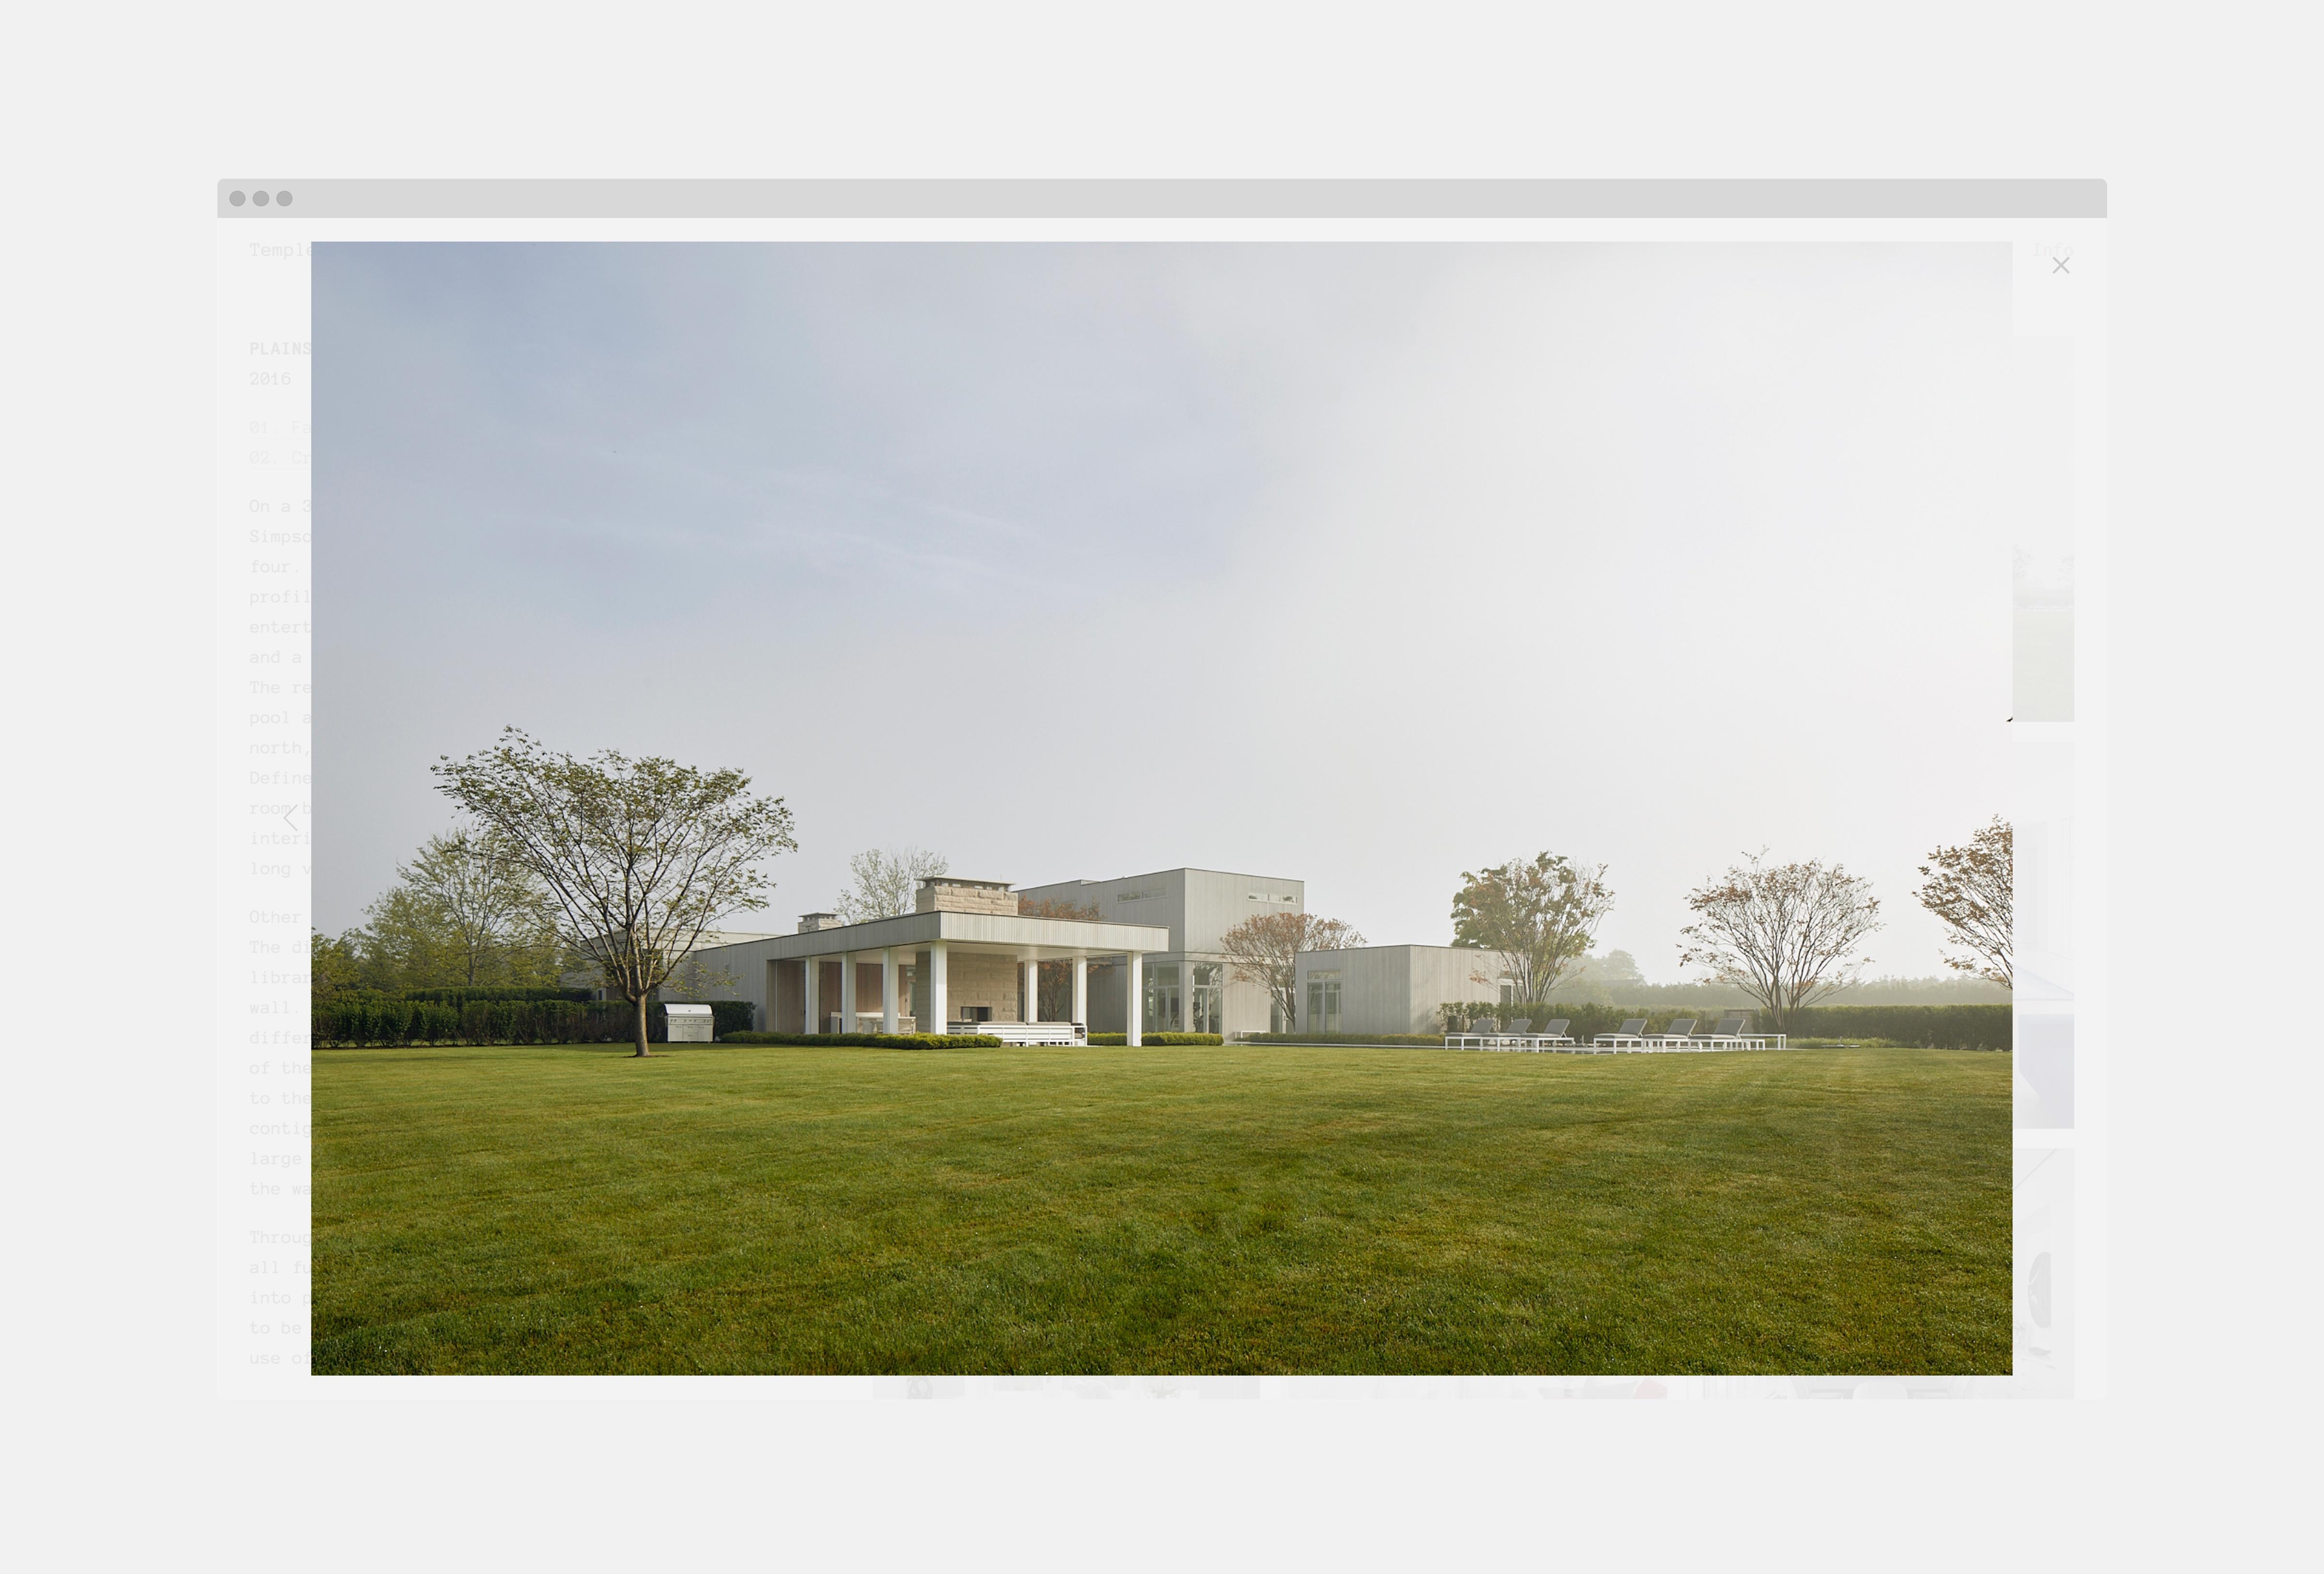 Temple Simpson Studio - Lovably